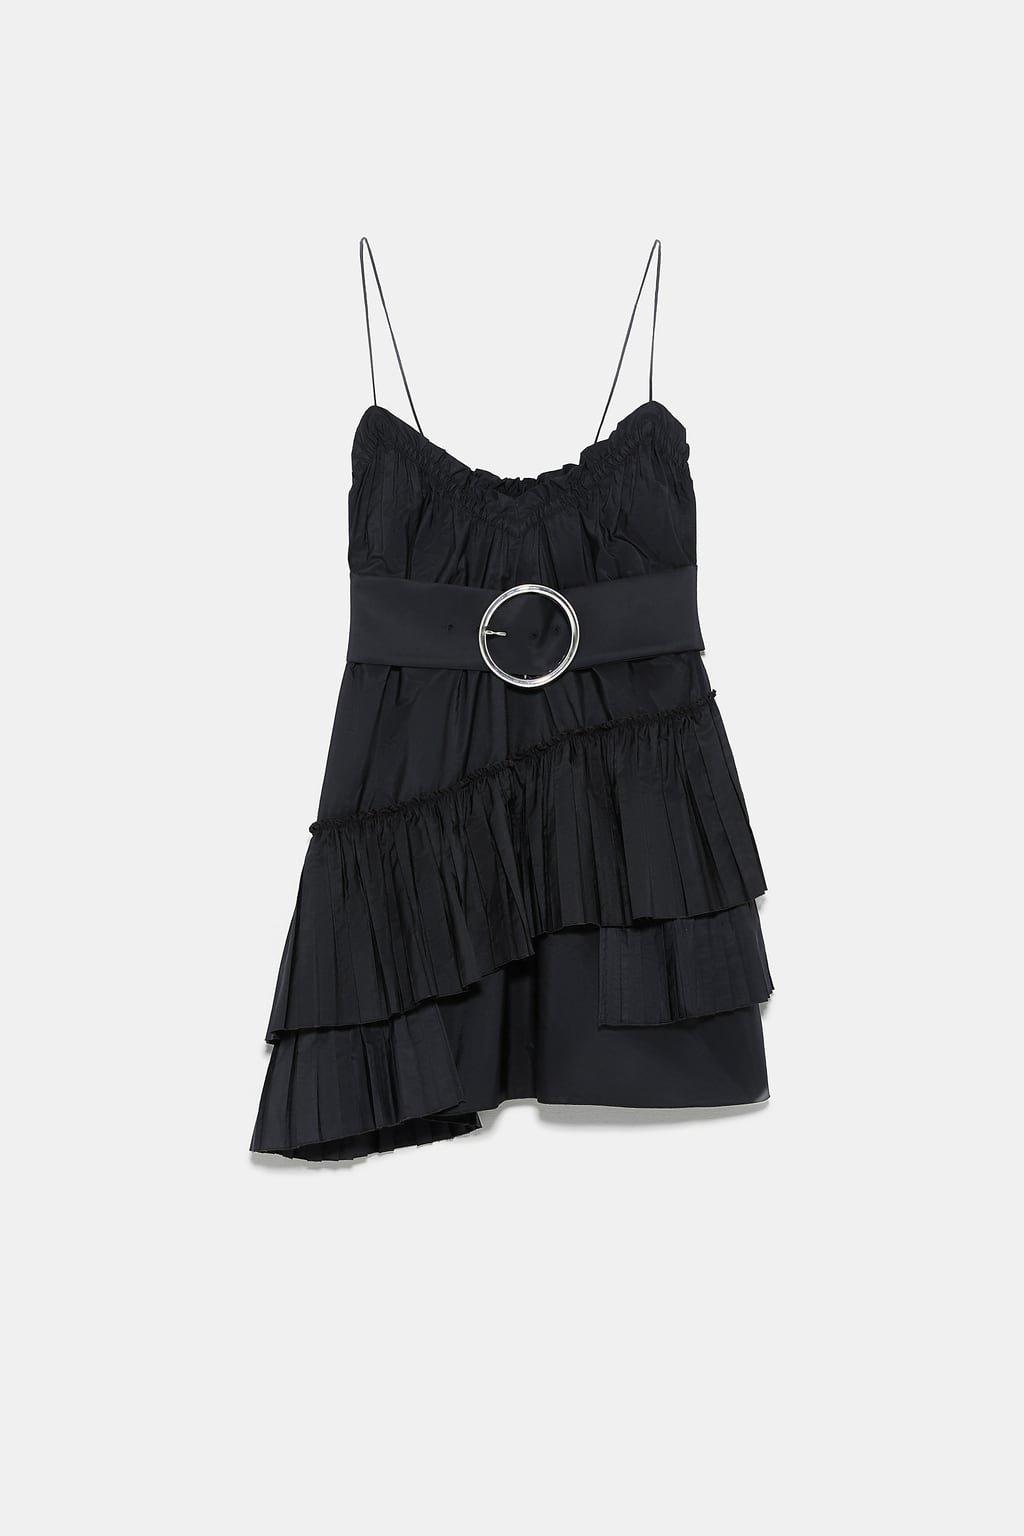 BELTED MINI DRESS - BASICS-WOMAN | ZARA United States black